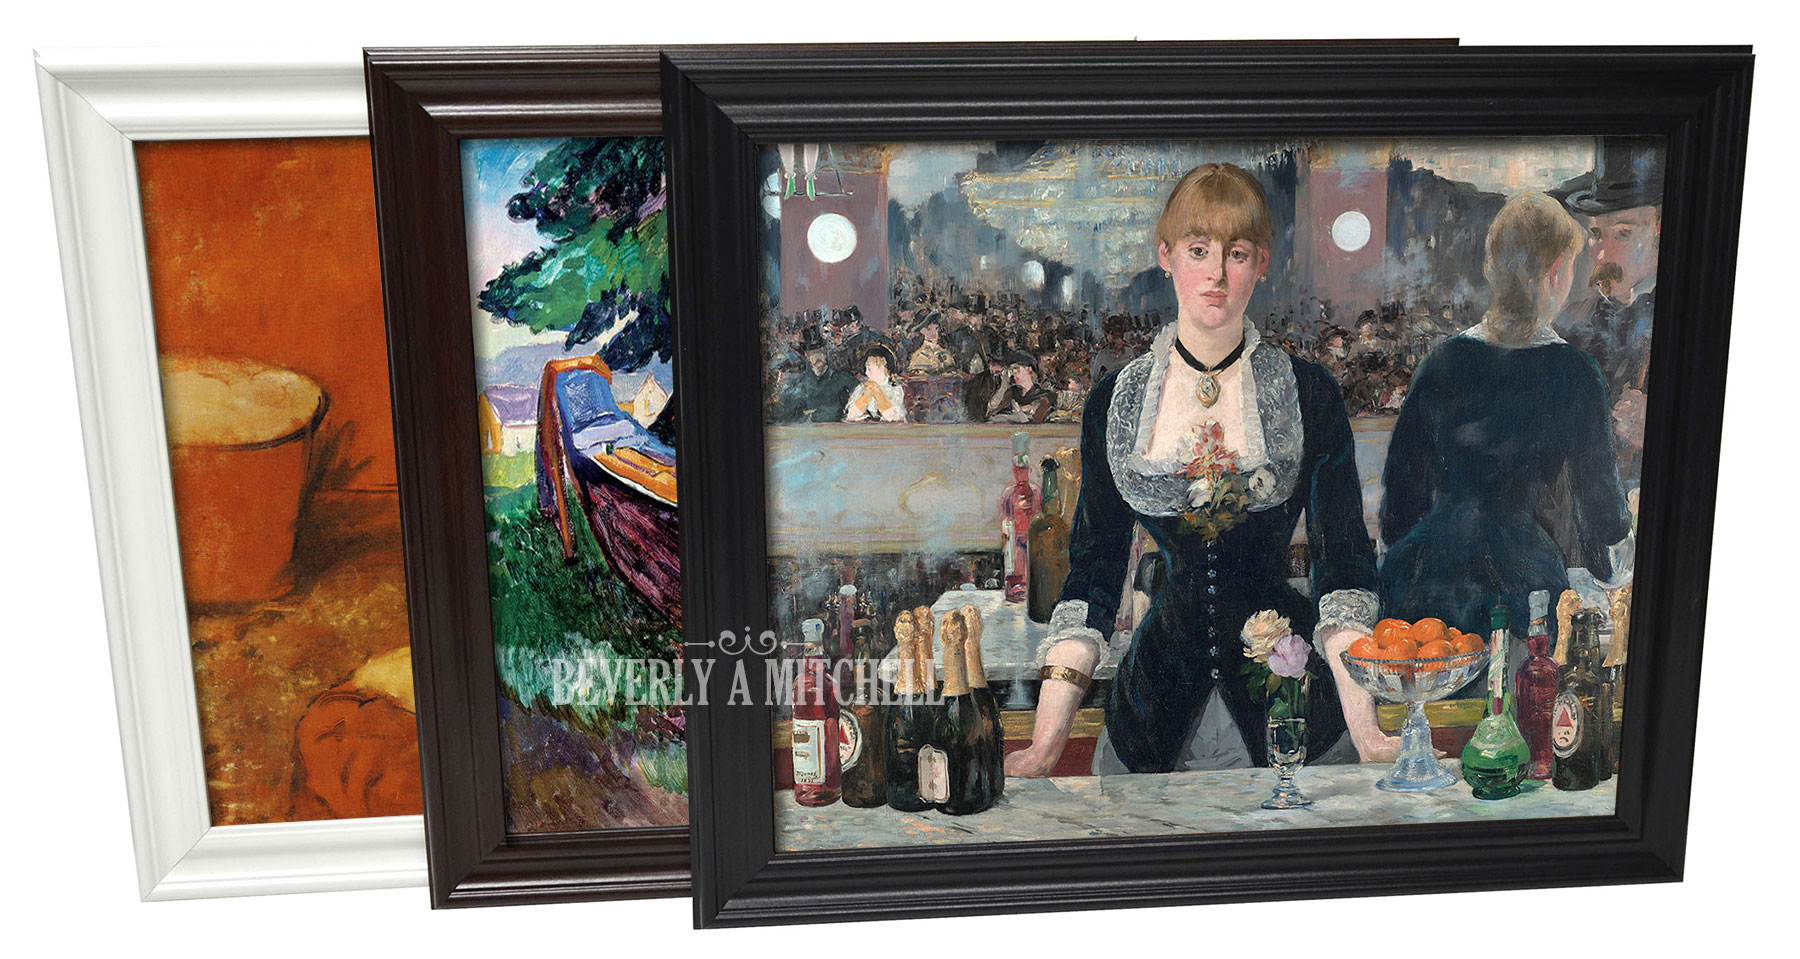 Beverly A Mitchell Frames